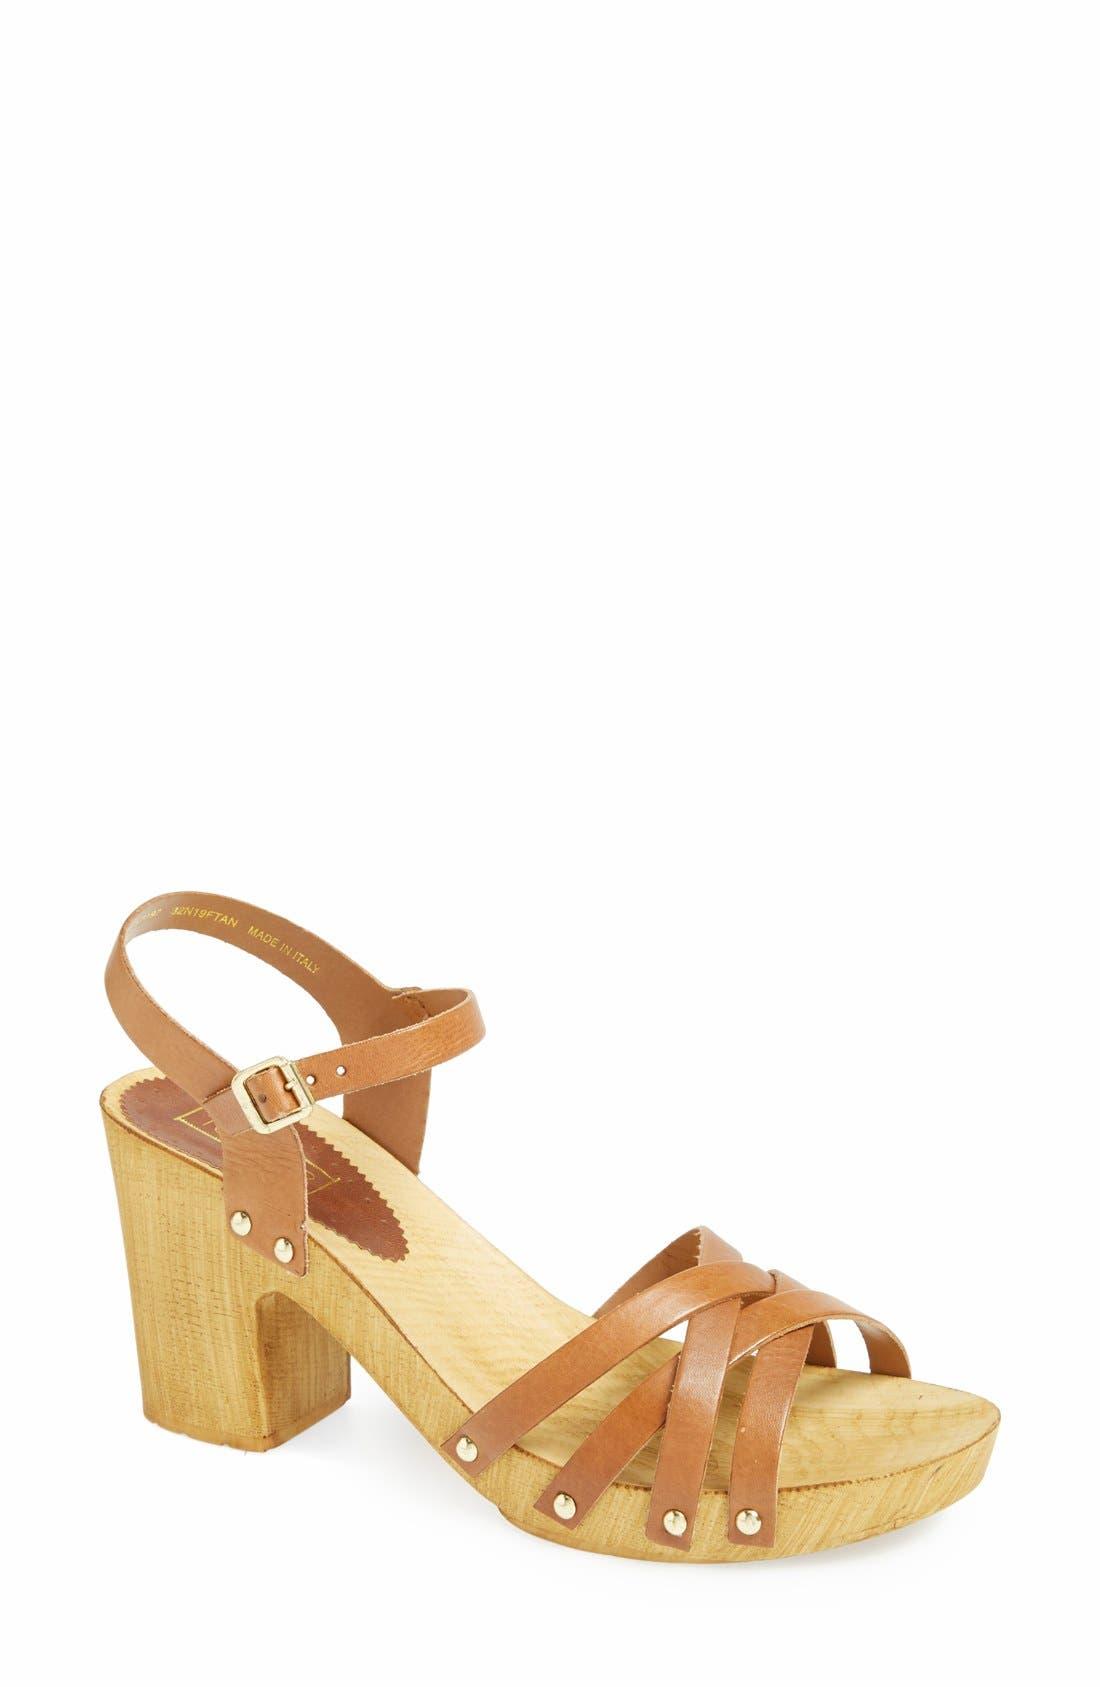 Alternate Image 1 Selected - Topshop 'Nancy' Leather Sandal (Women)